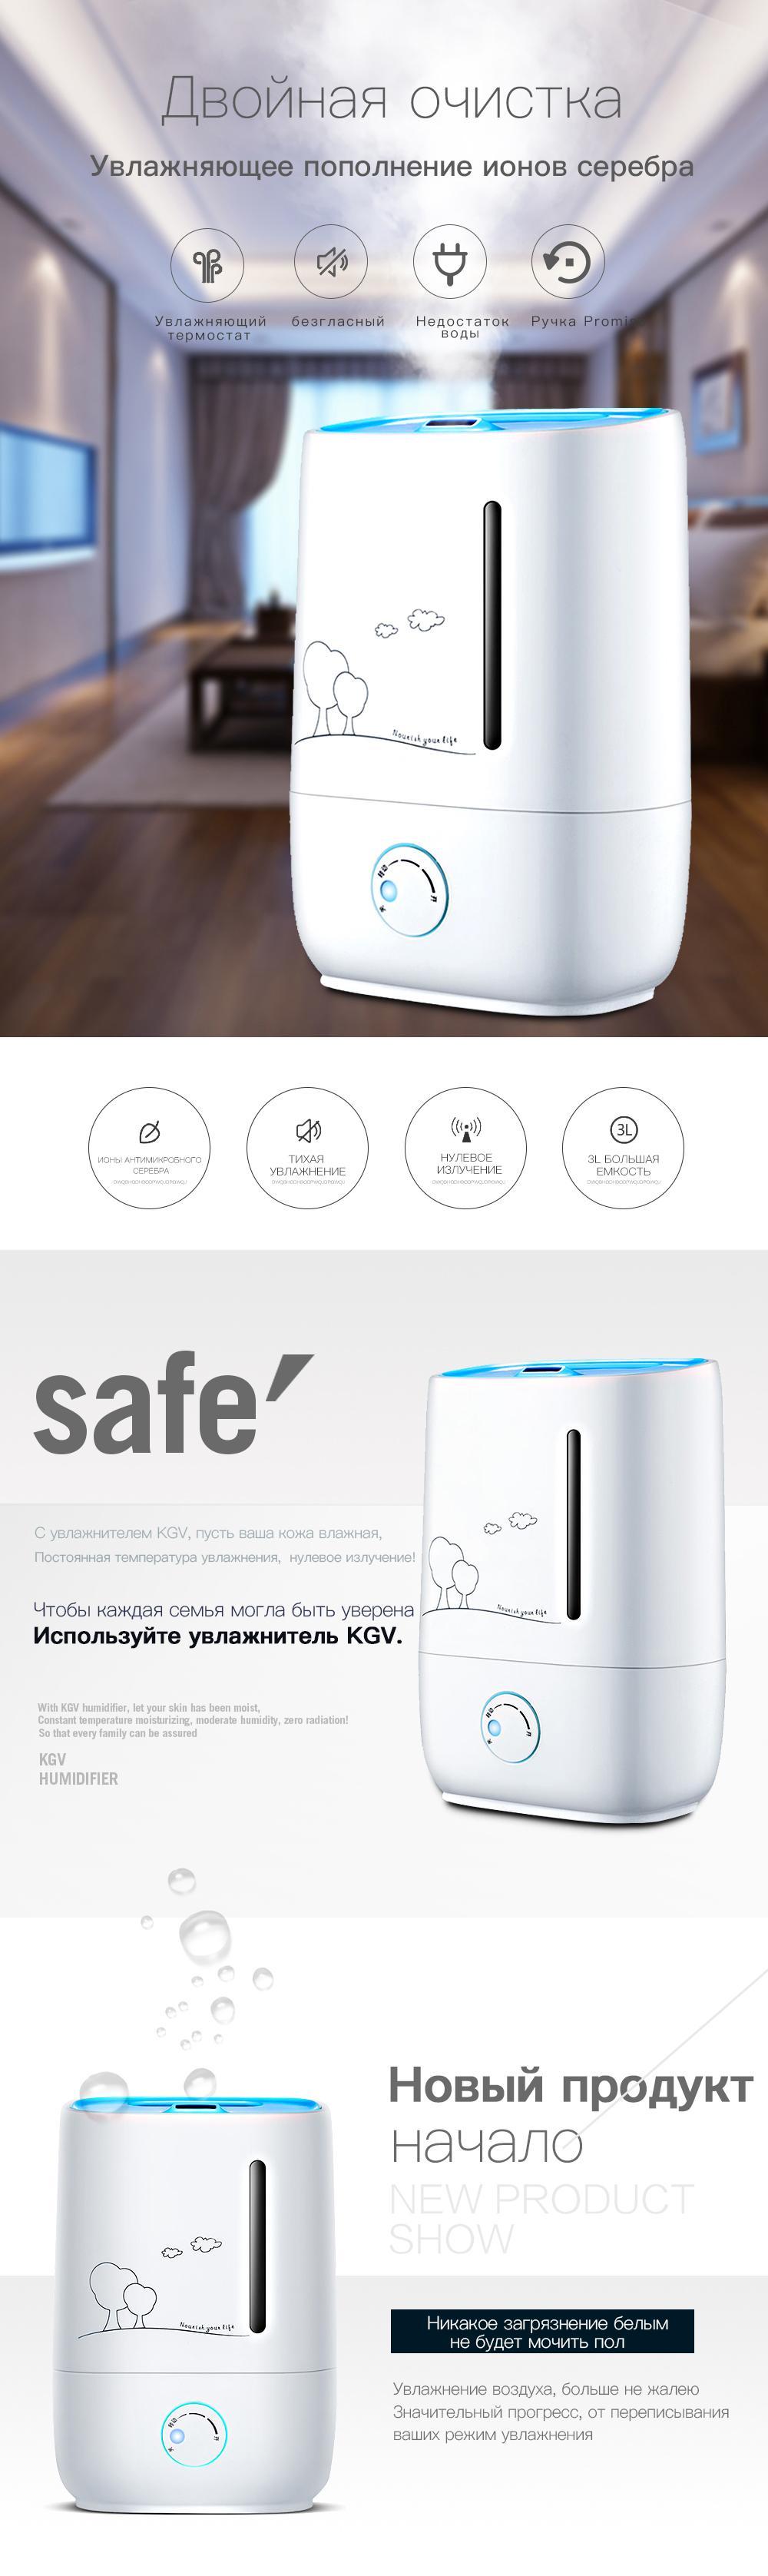 KGV Ultrasonic Humidifier for Home Yoga Air Purifier Nano